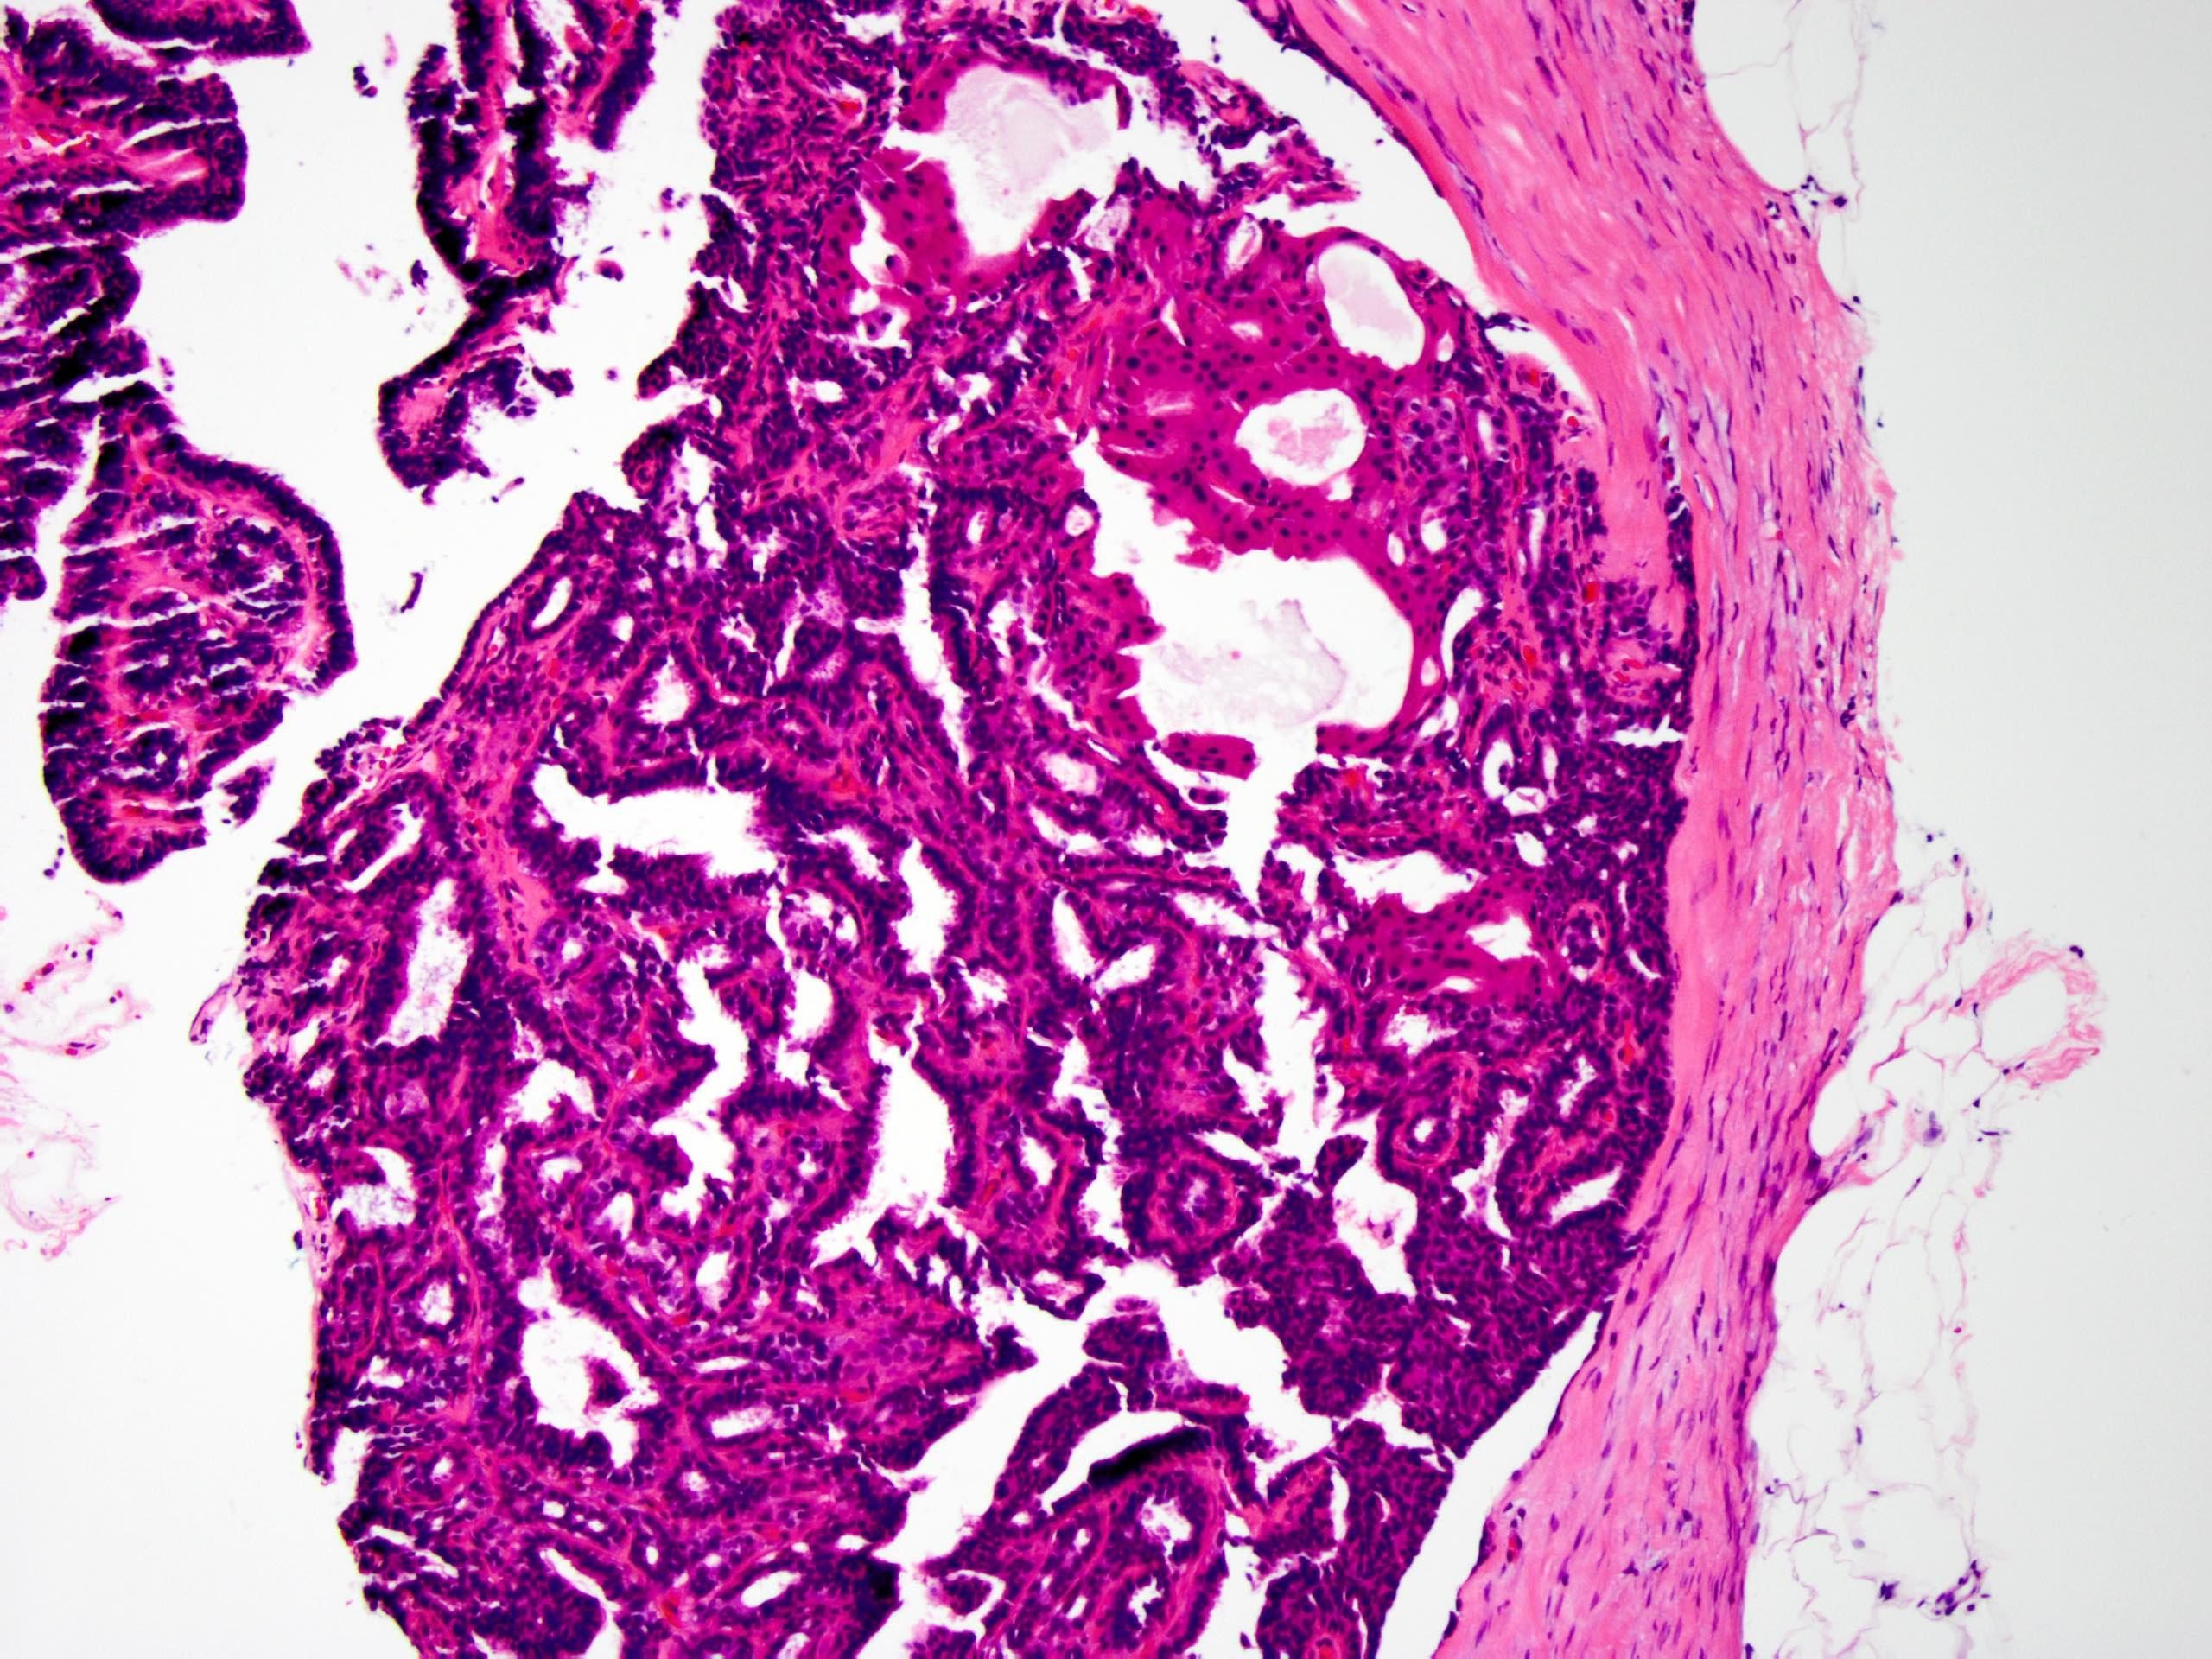 intraductalis papilloma ductalis hyperplasiaval az intraductalis papillómákat el kell távolítani